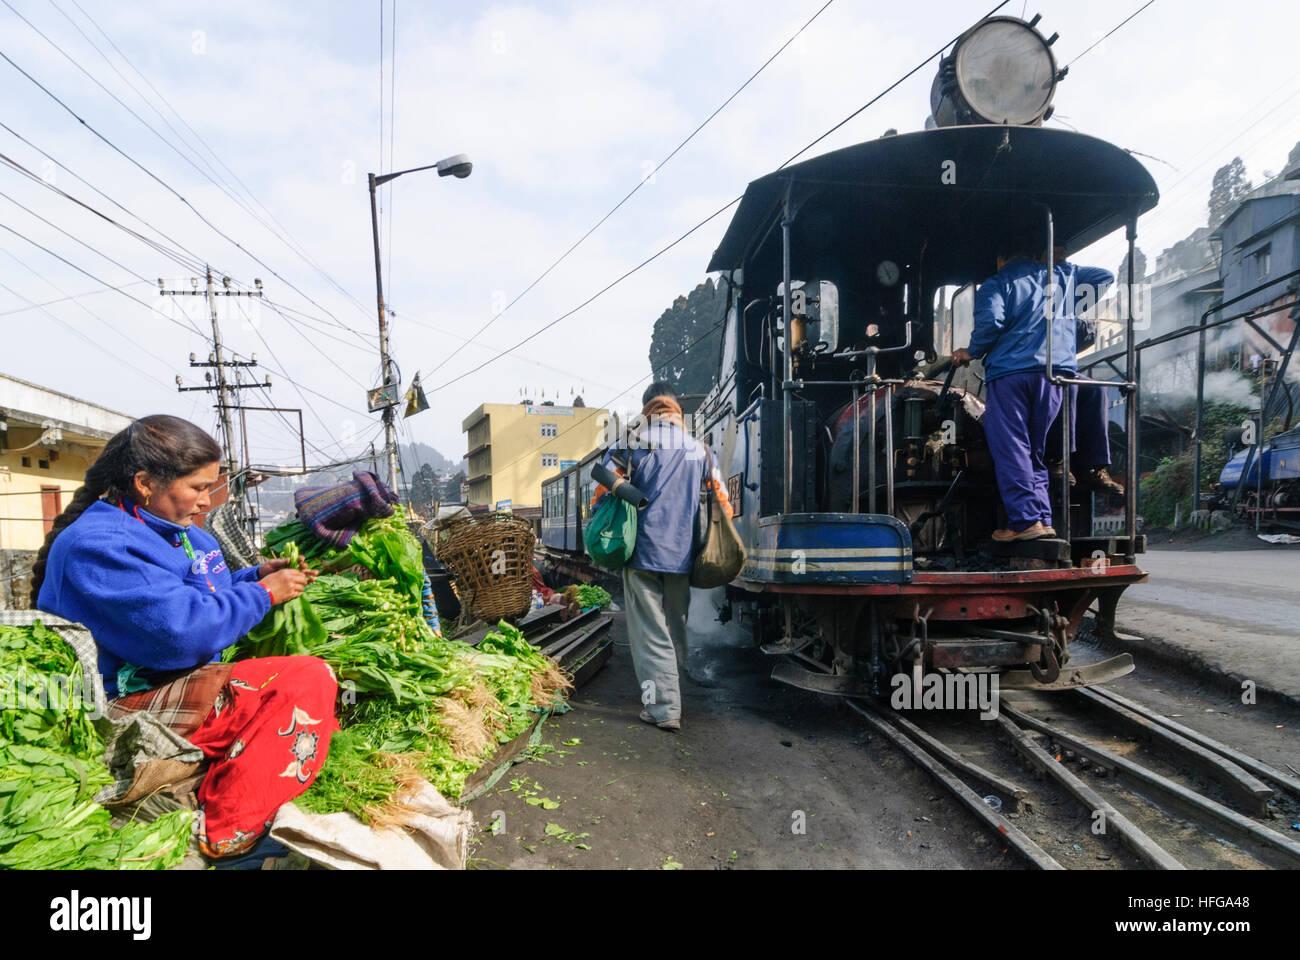 Darjeeling: Darjeeling Himalayan Railway at Darjeeling Railway Station, West Bengal, Westbengalen, India - Stock Image